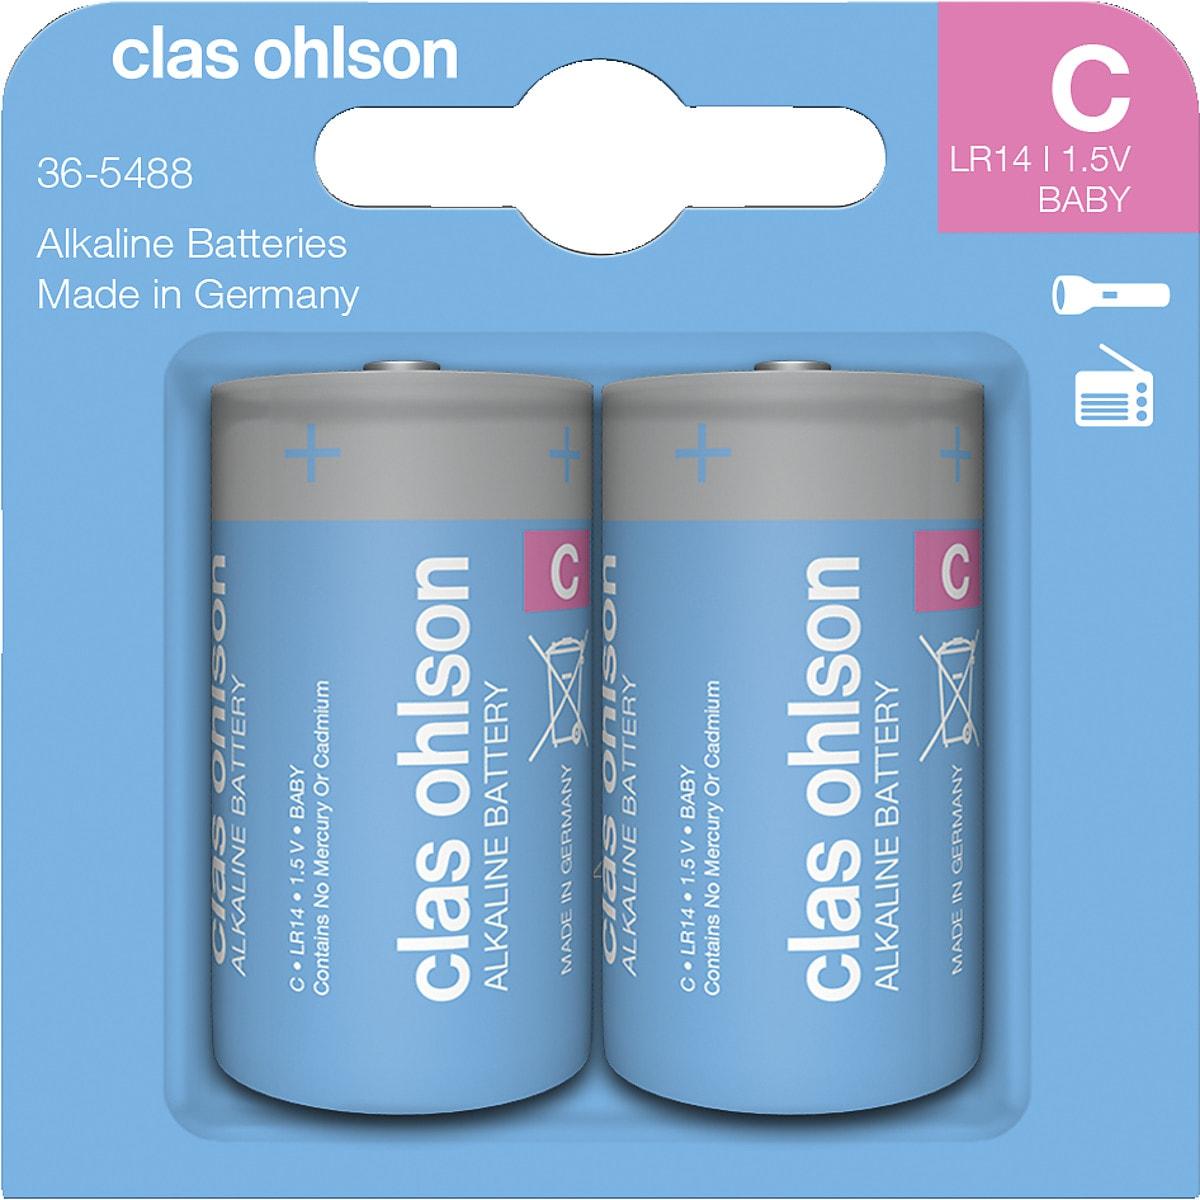 Alkalische Batterie C/LR14 Clas Ohlson